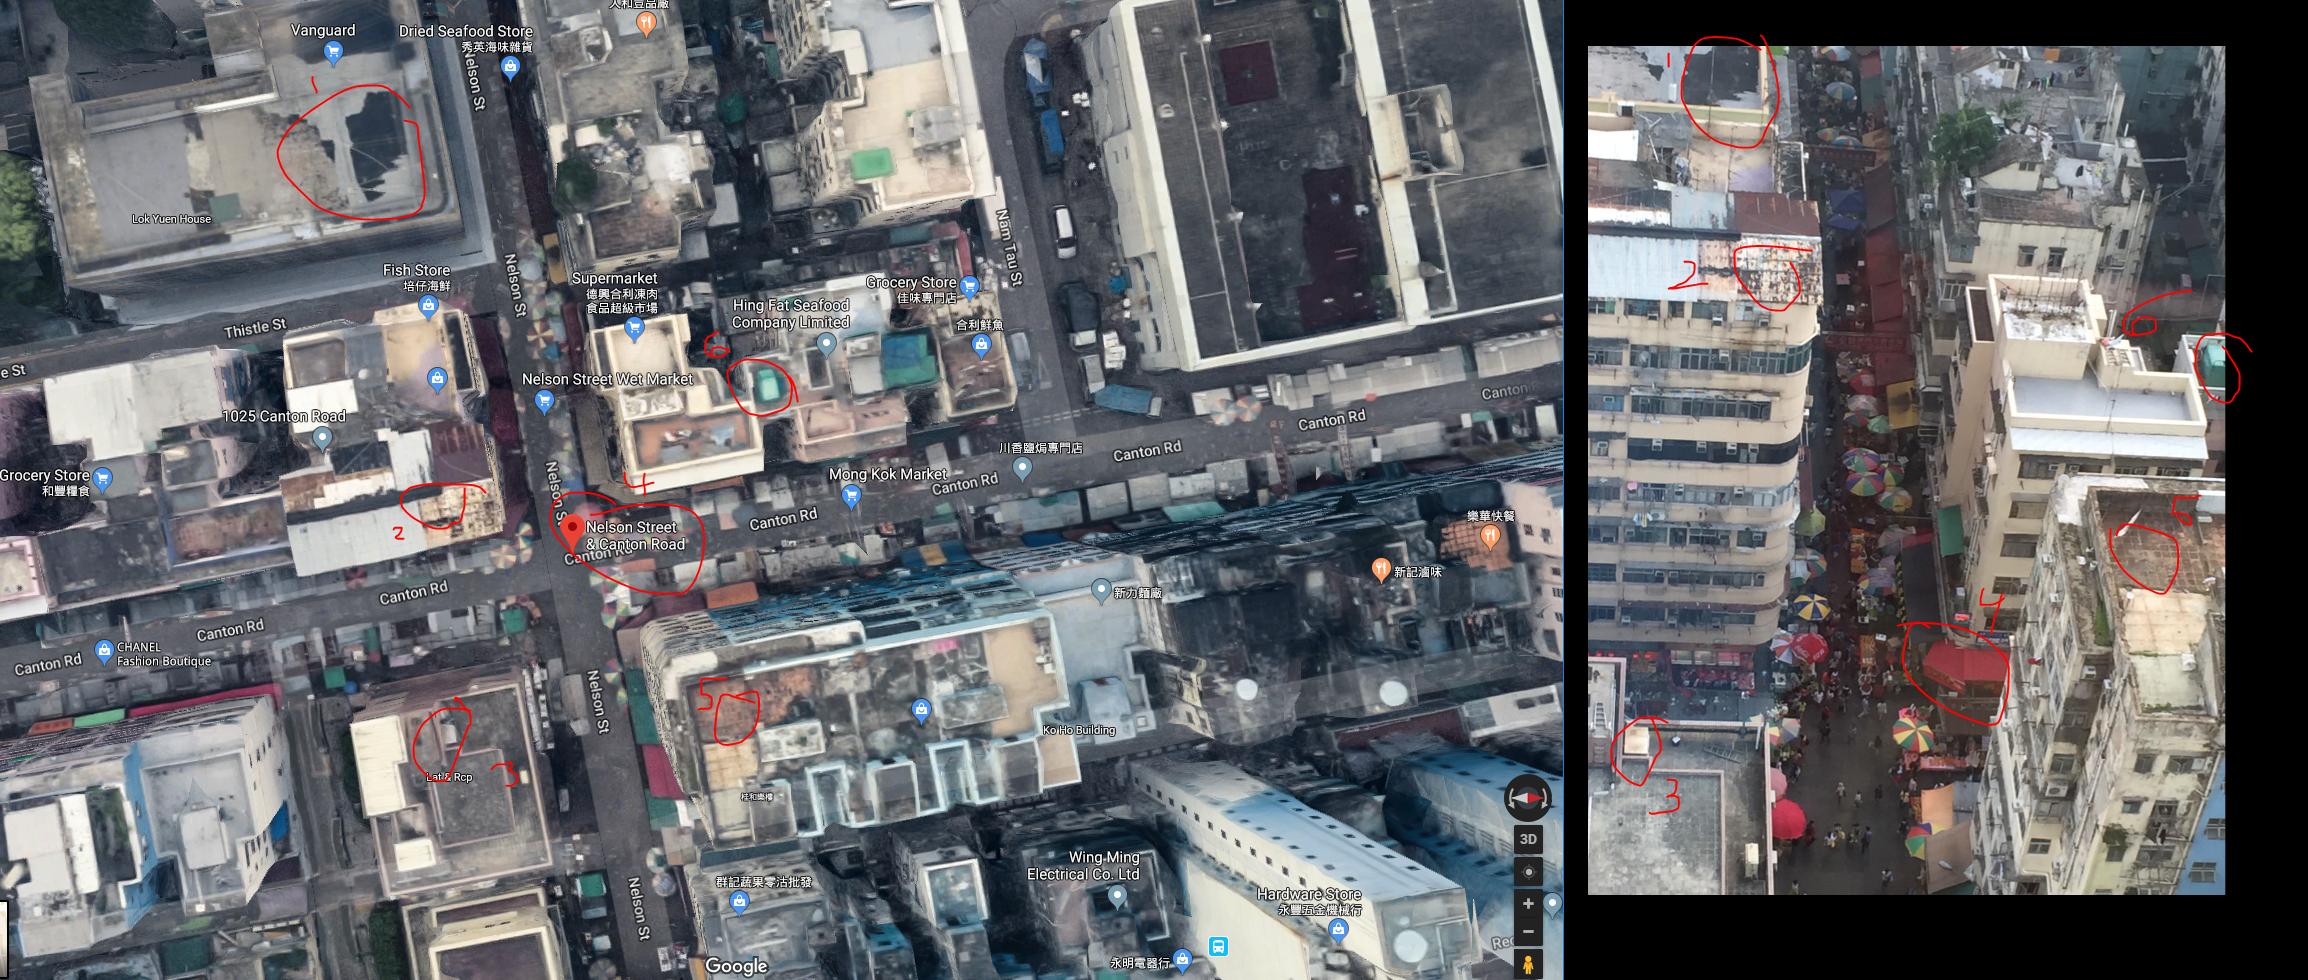 More #NewQ on #Snowden + Snowden Location CONFIRMED!